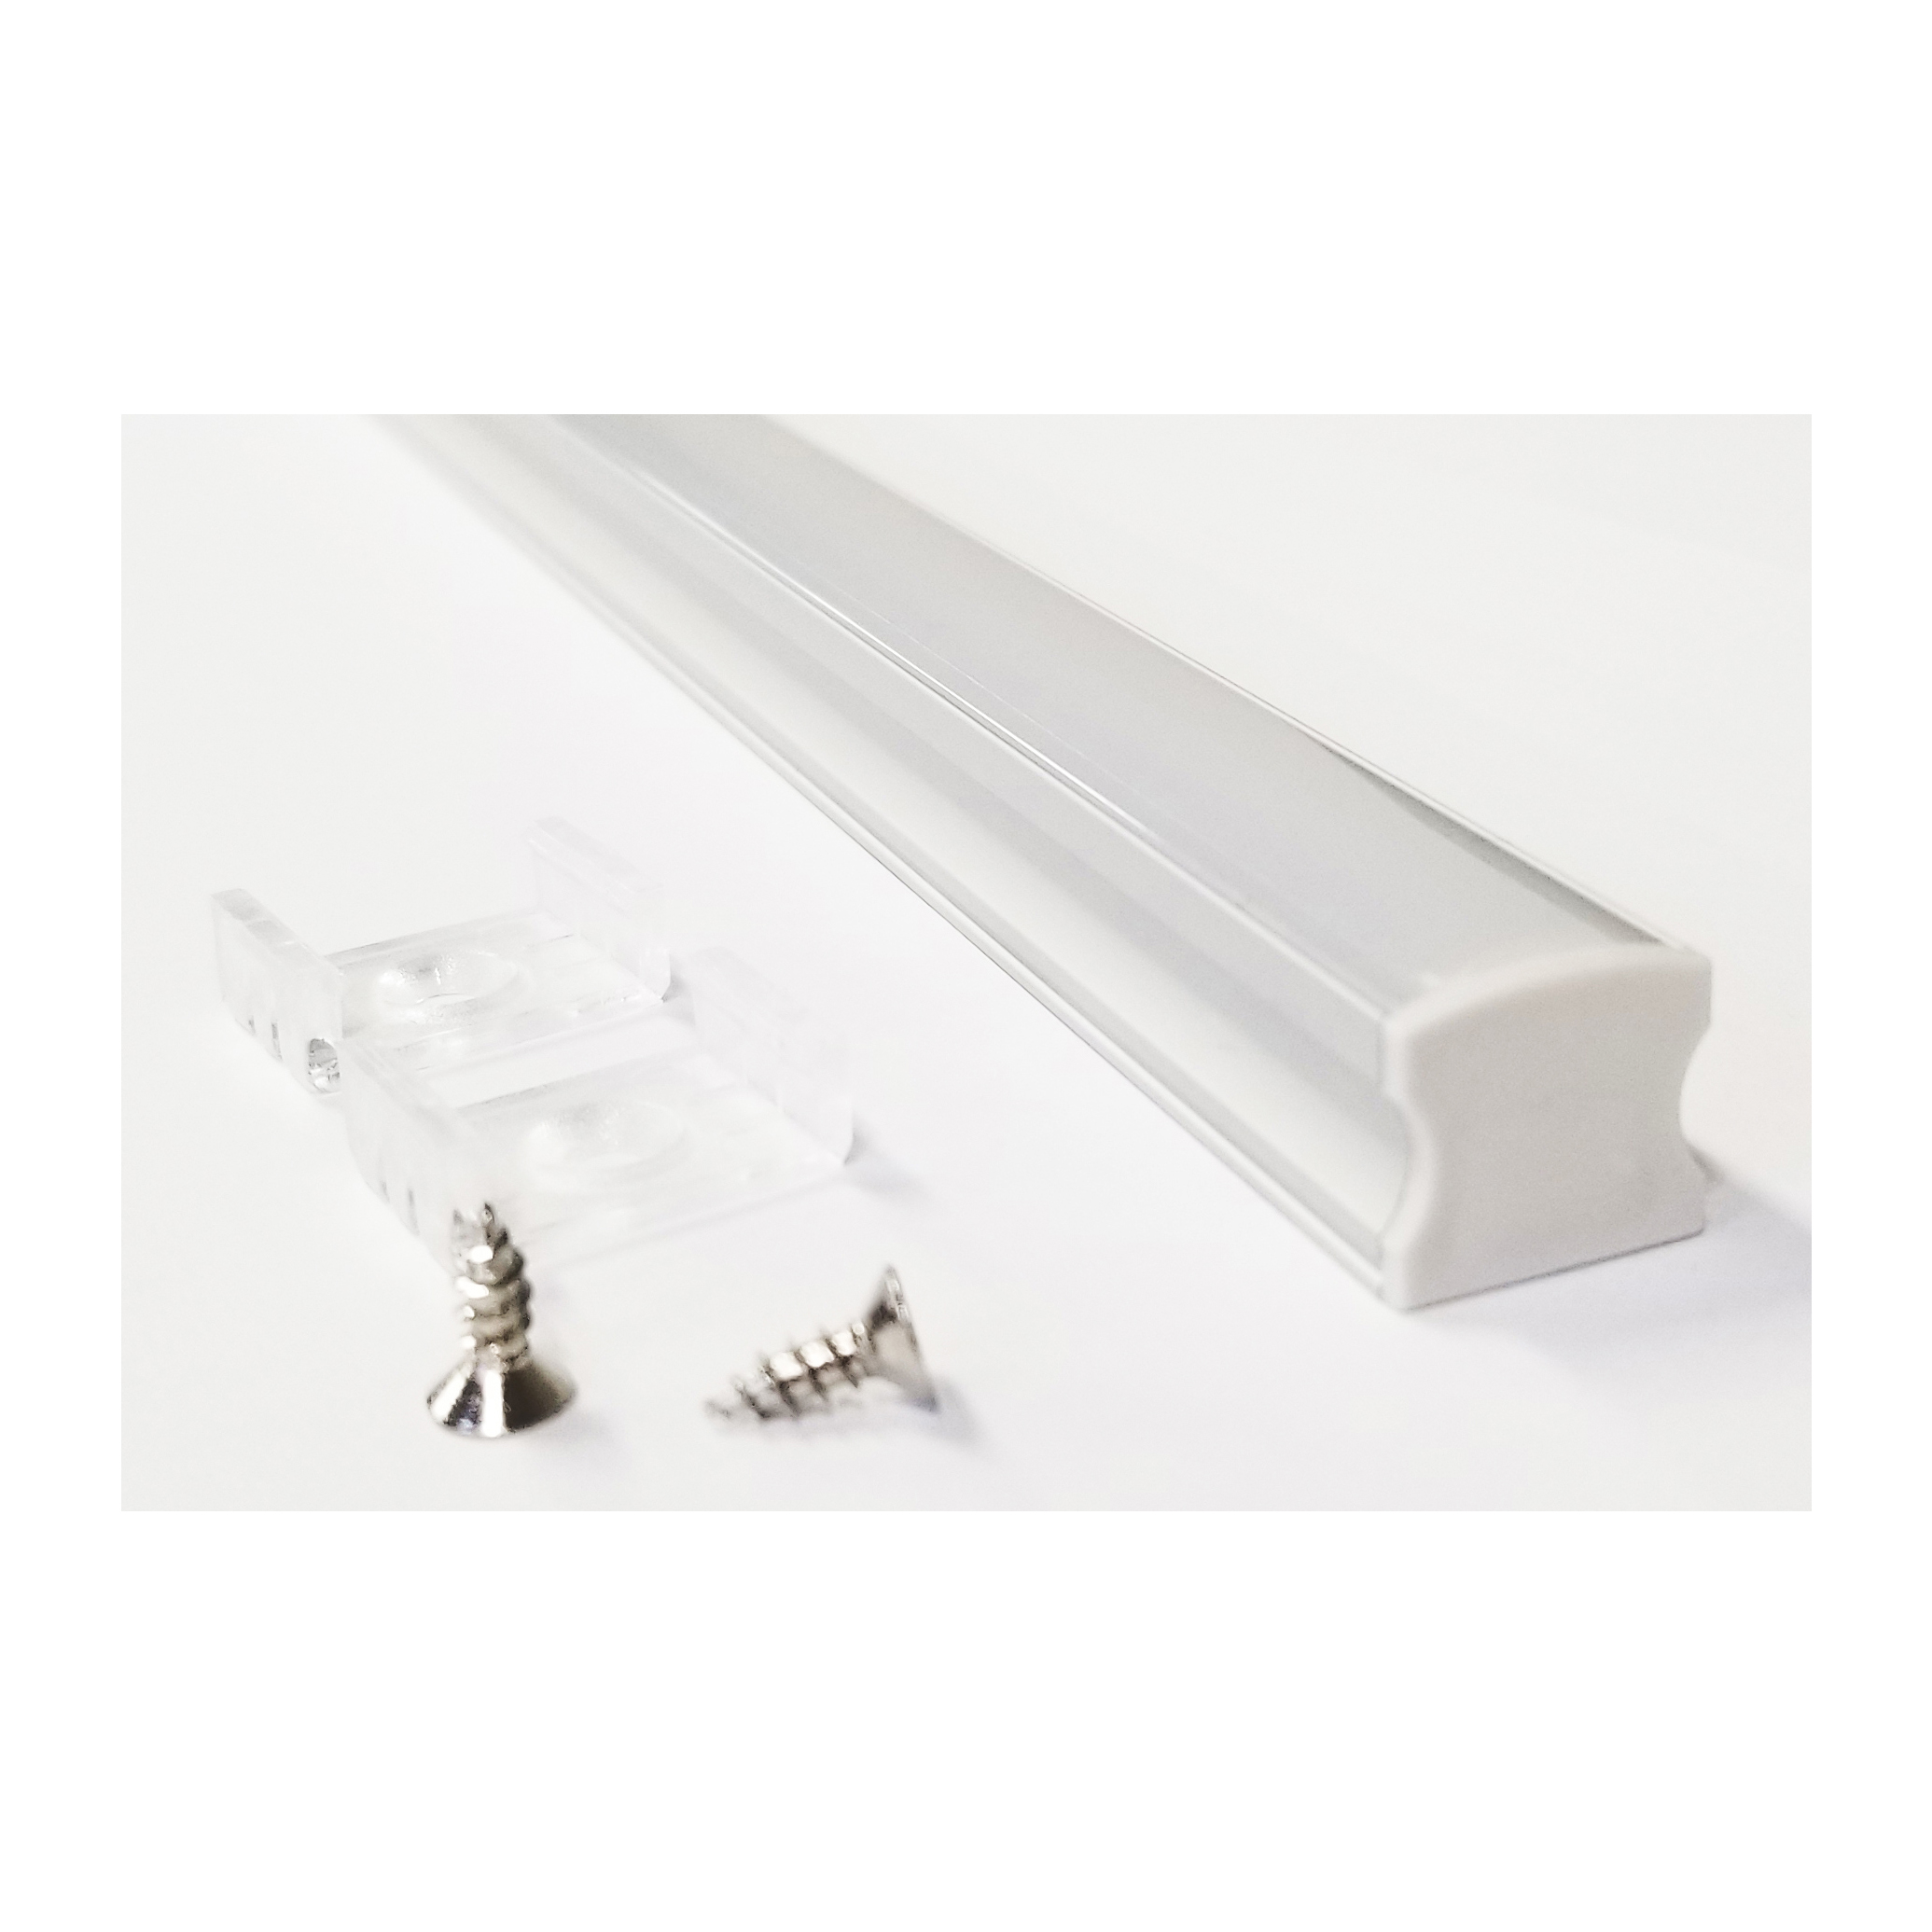 LED Strip Light KU-1515-1M